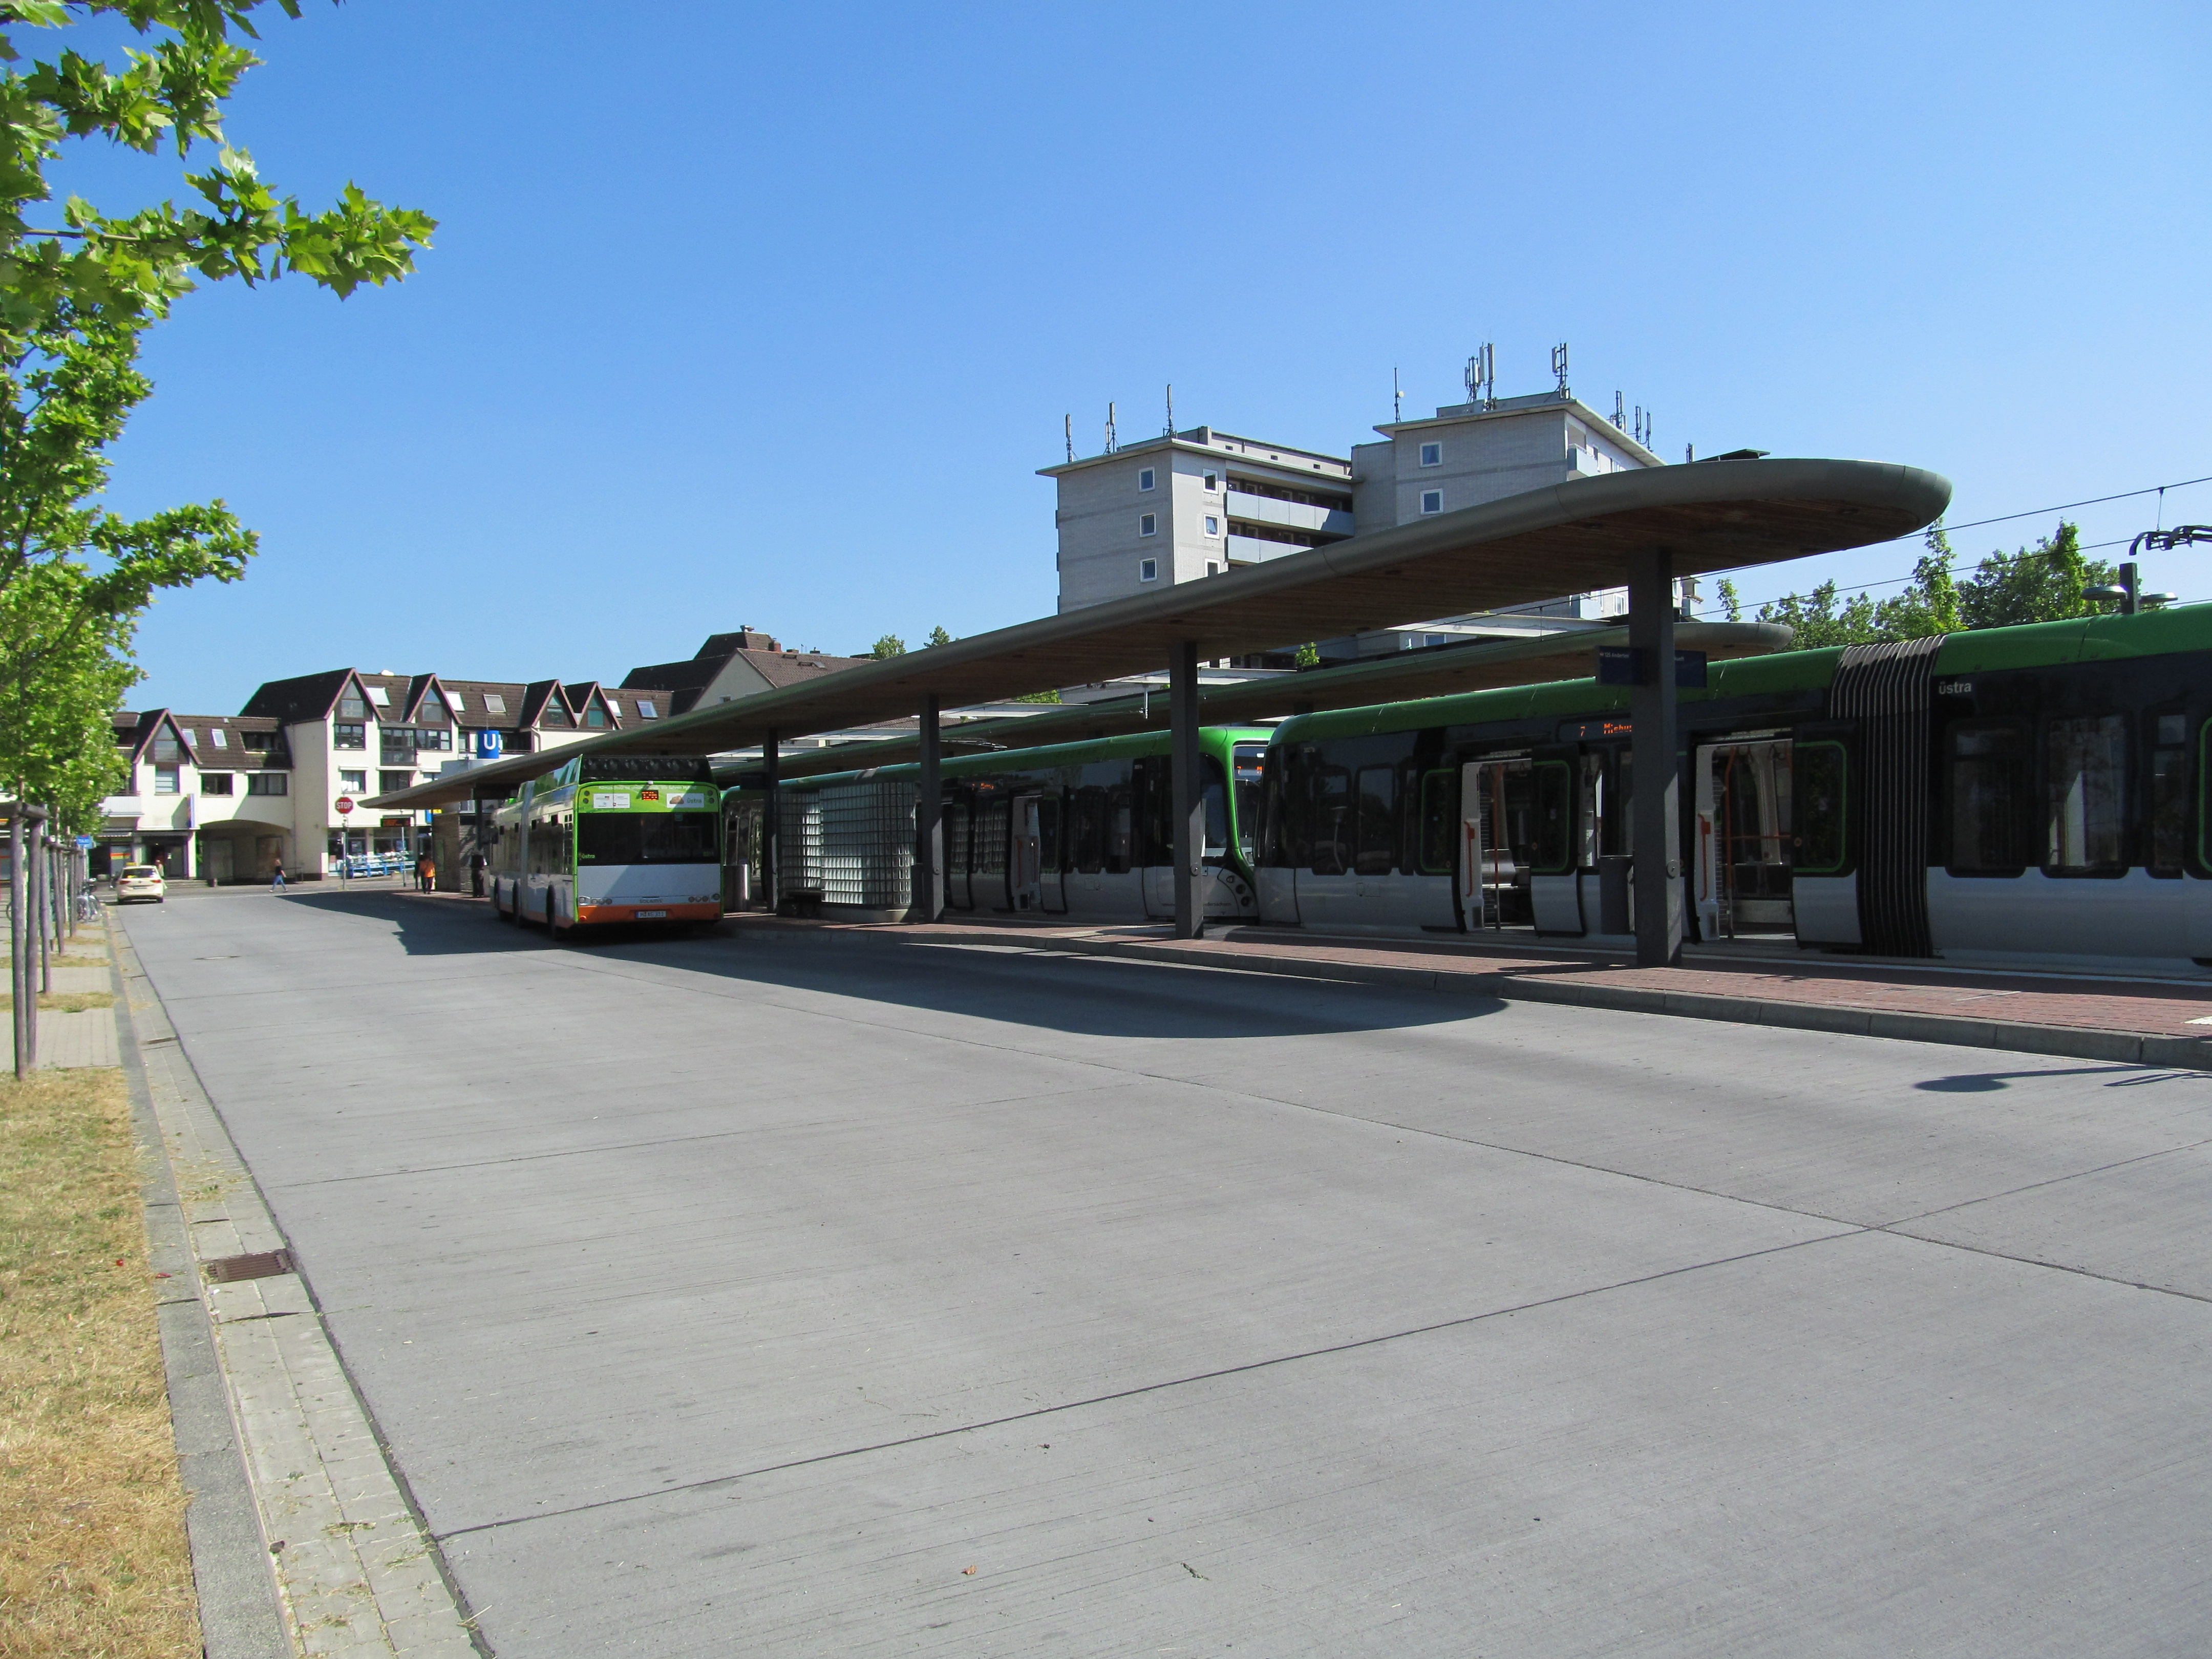 Misburg